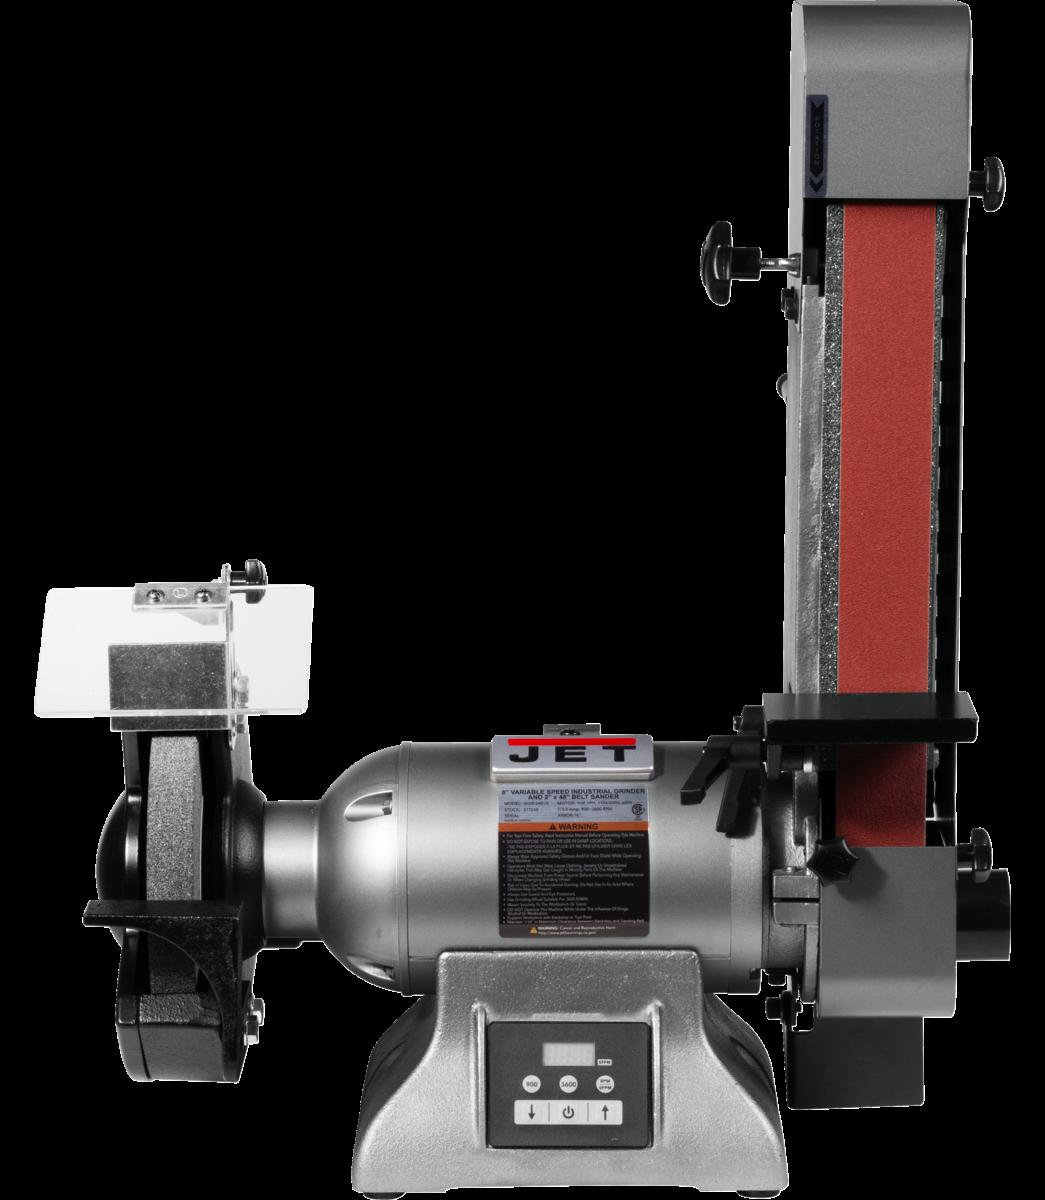 IBGB-248VS 8-Inch Variable Speed Industrial Grinder and  2 x 48 Belt Sander